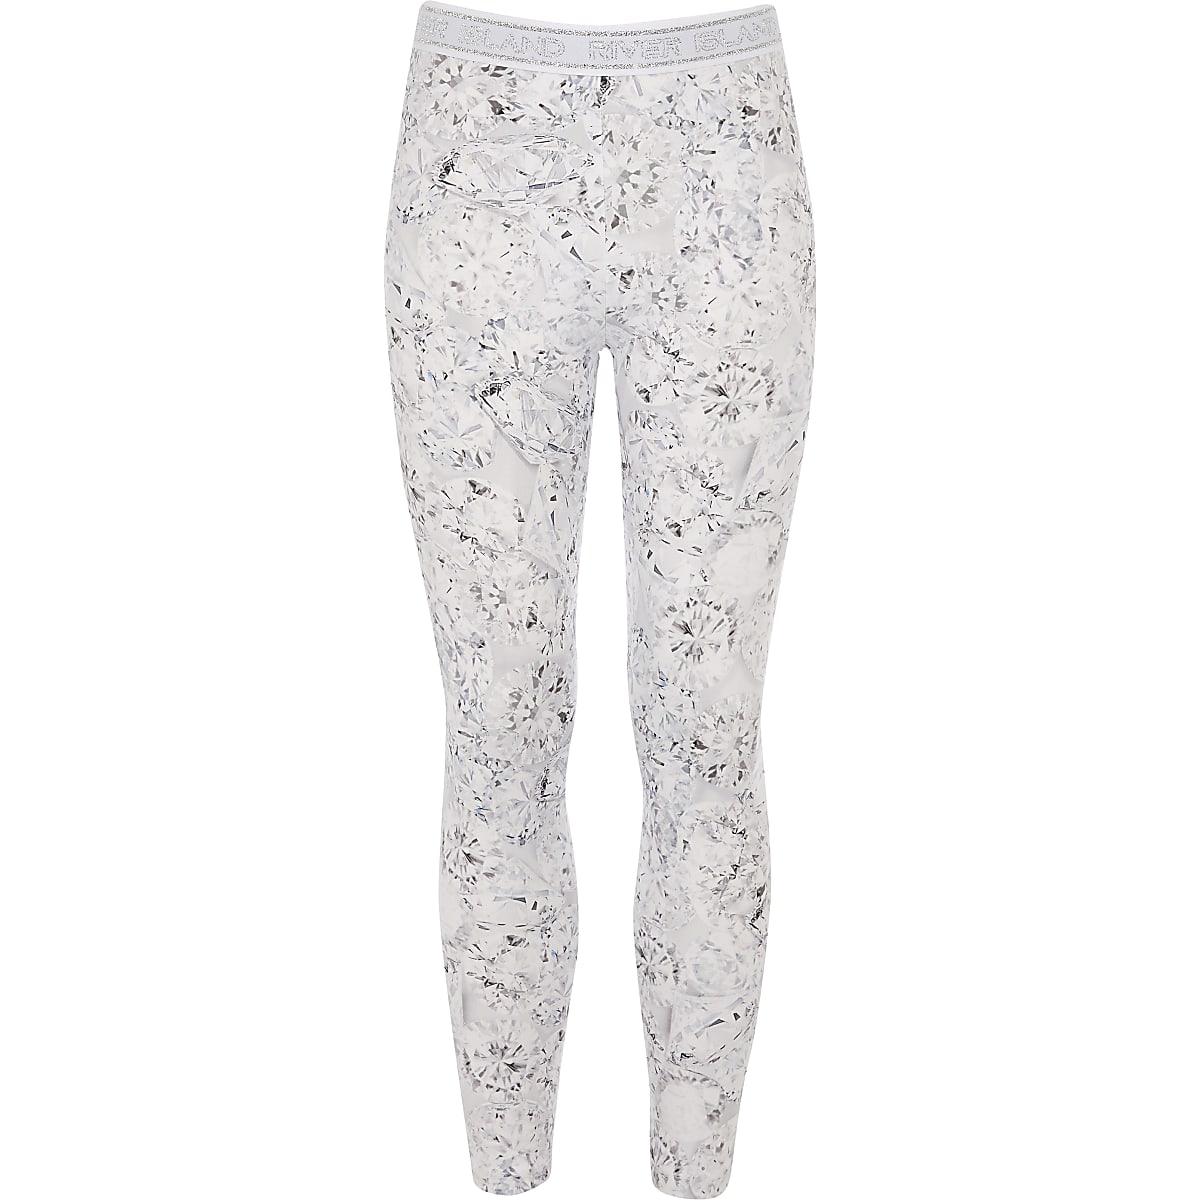 Girls RI Active silver diamond print leggings